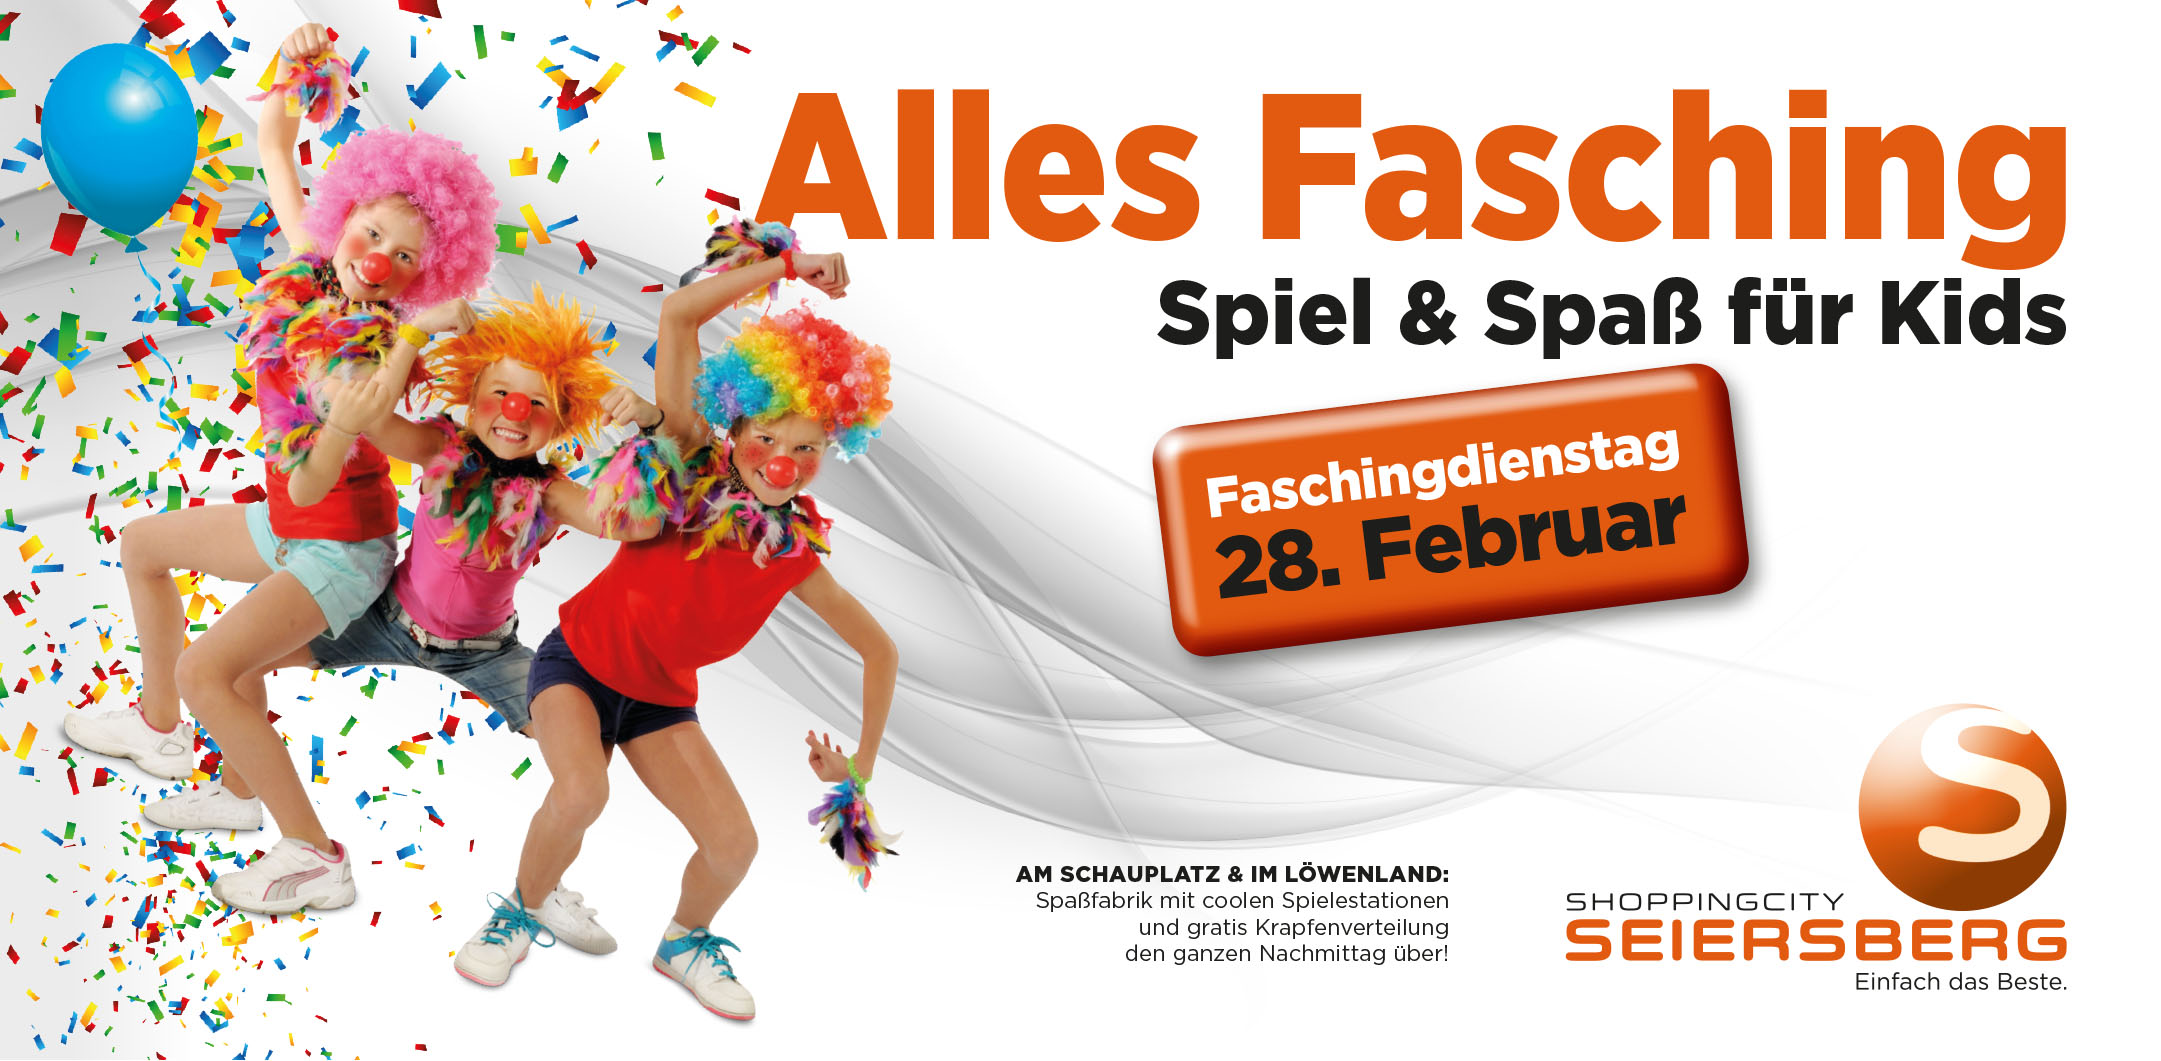 SC-Seiersberg-Image-Fasching